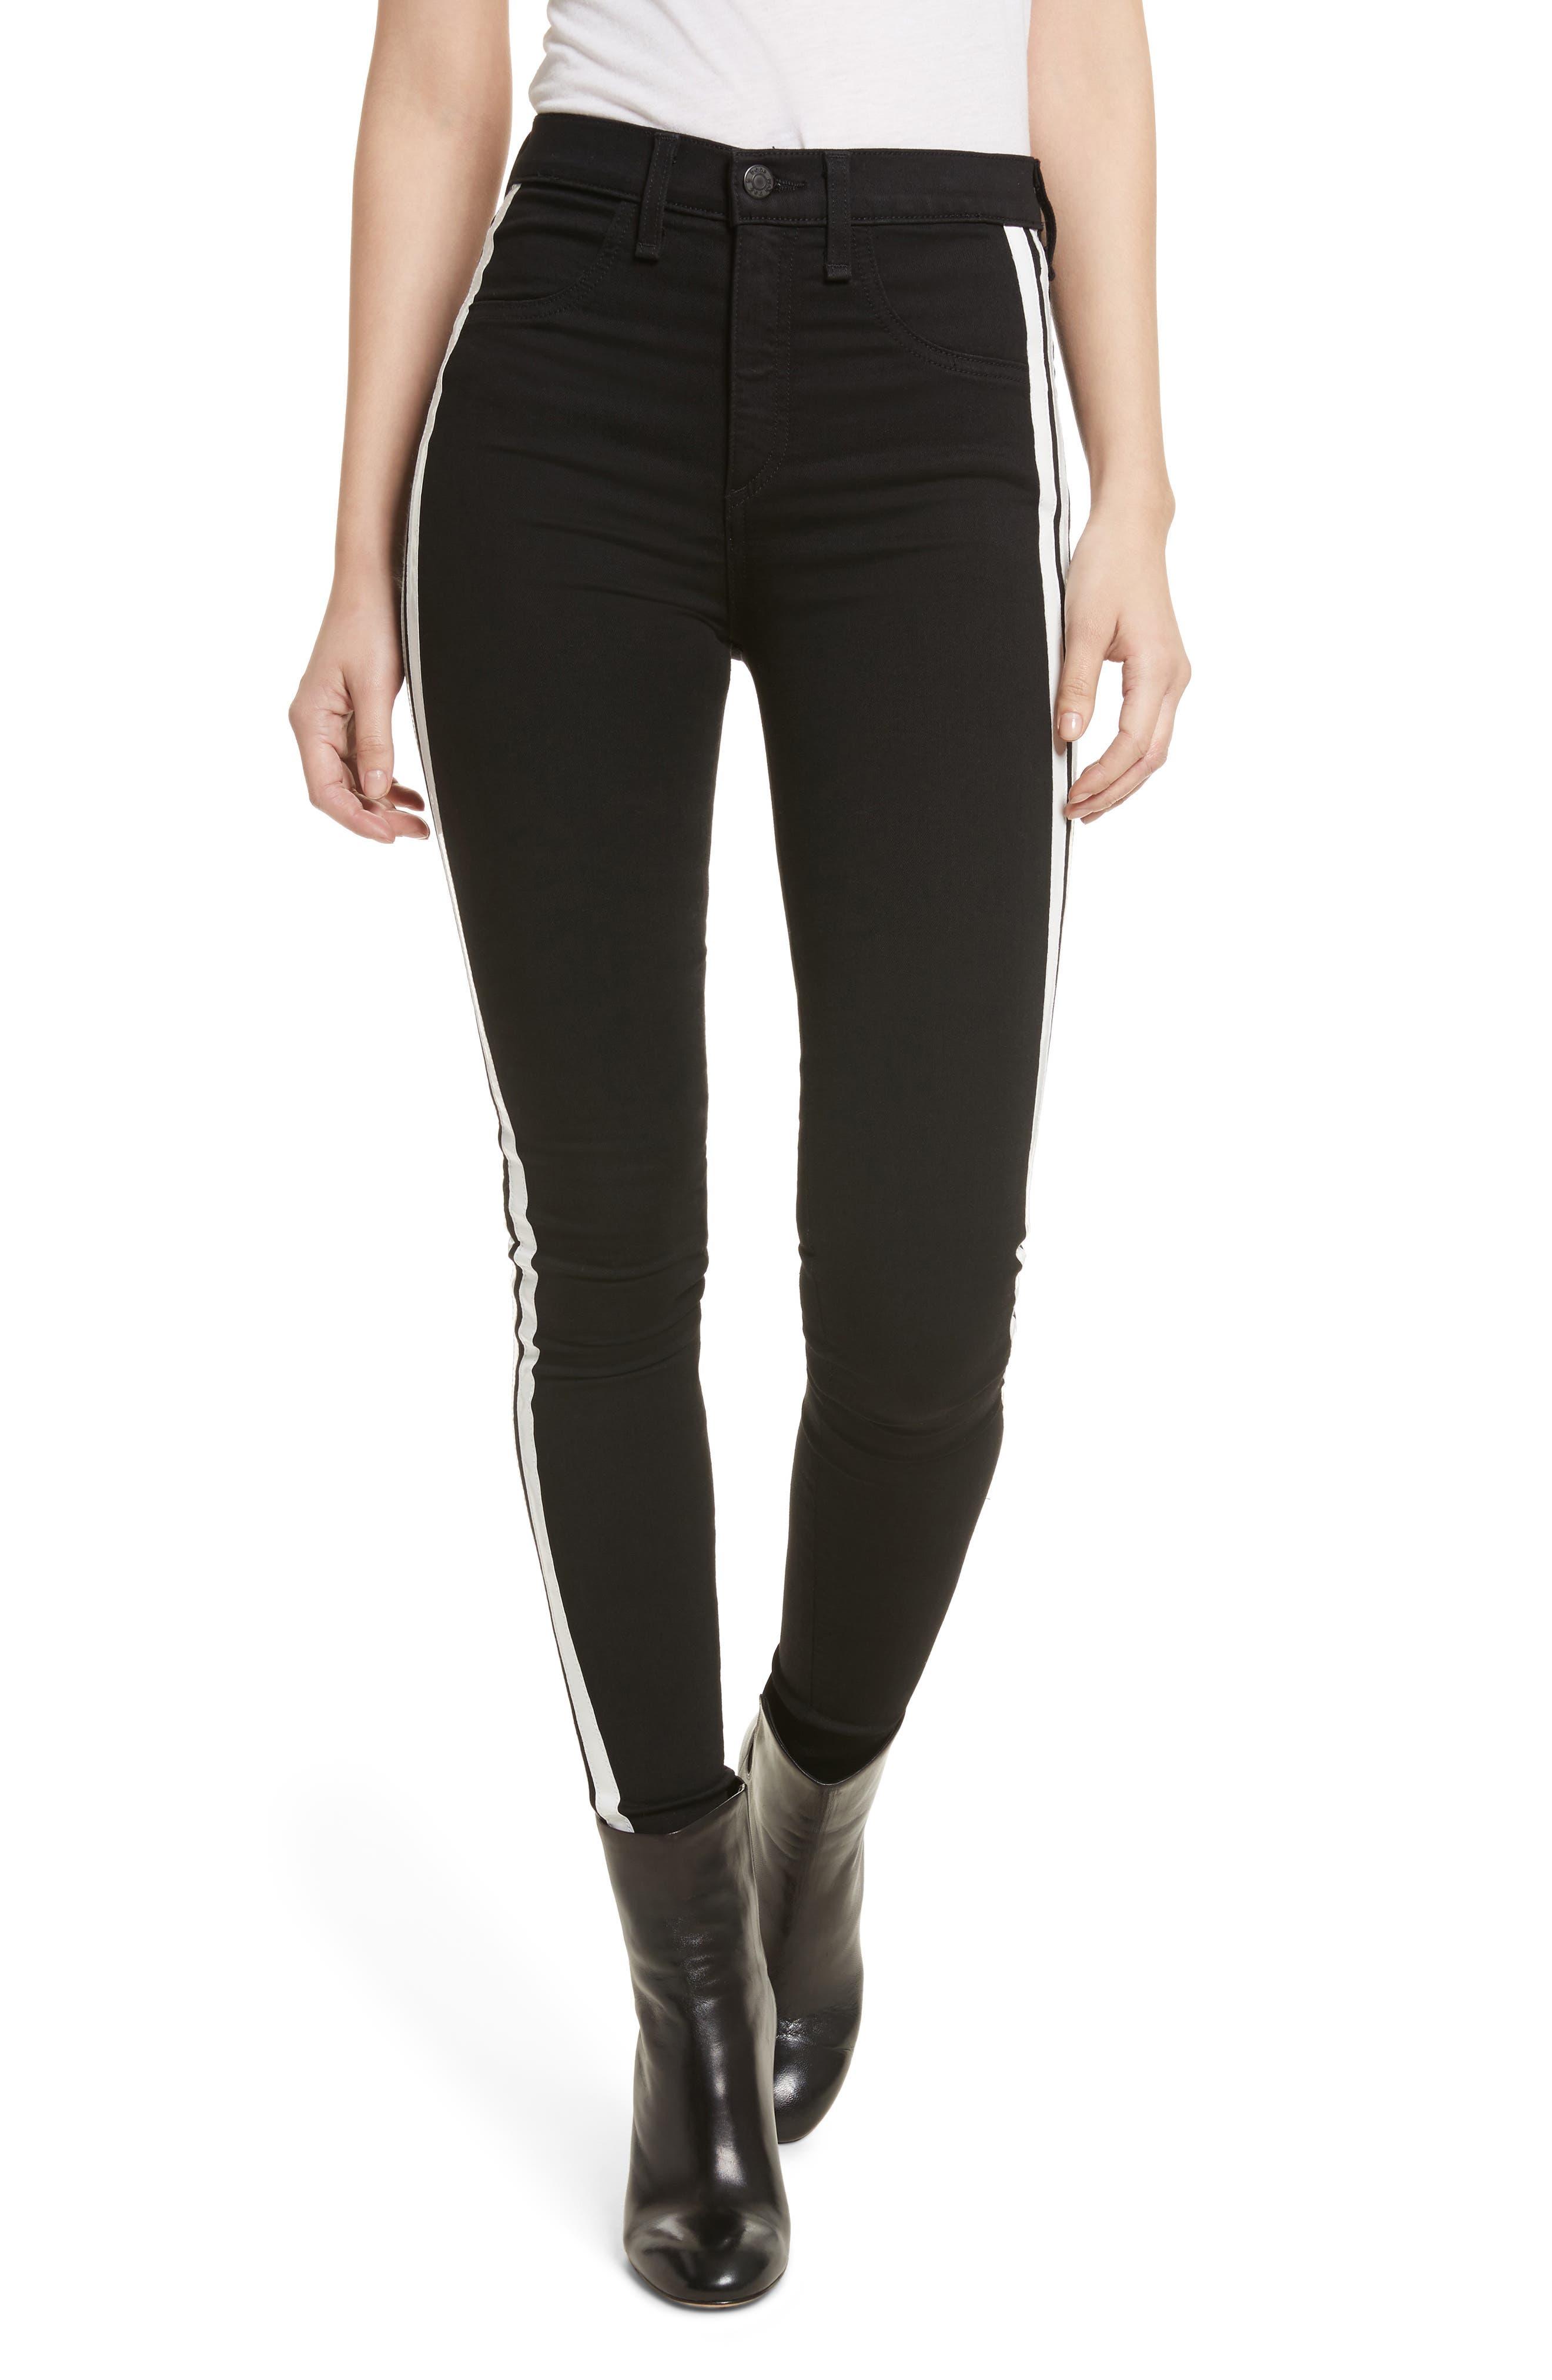 Mito High Waist Skinny Jeans,                         Main,                         color, Black